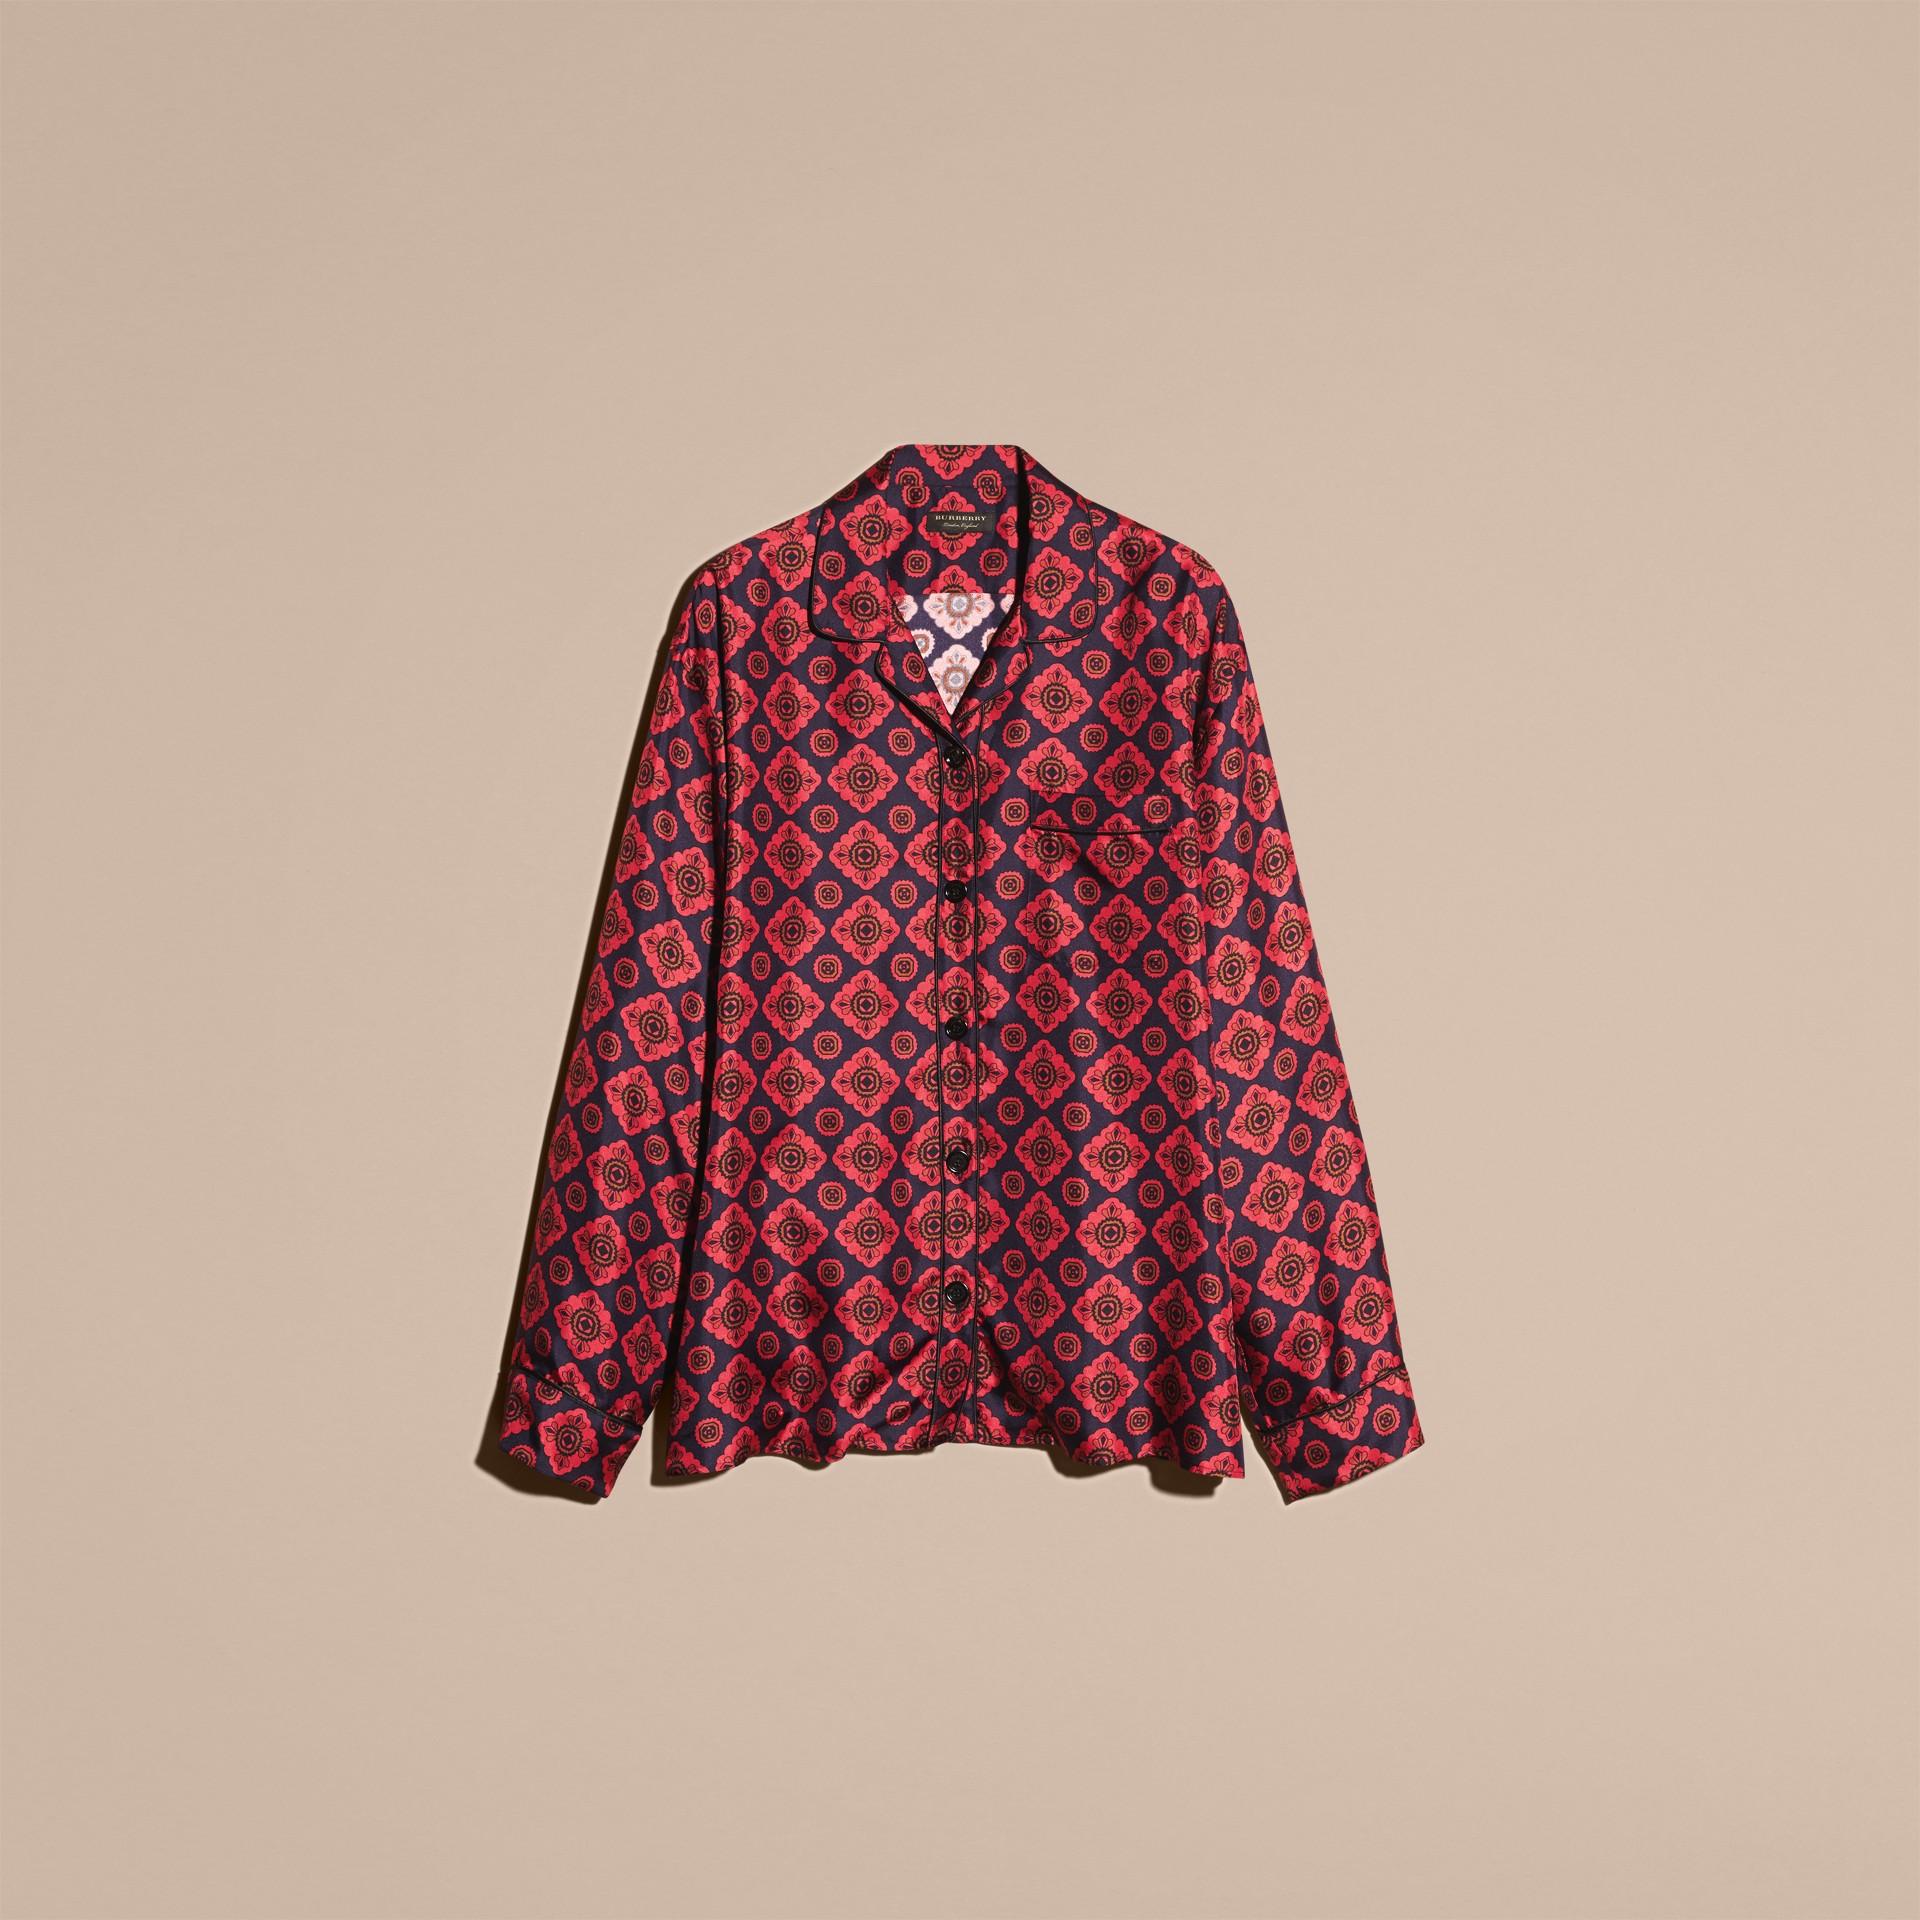 Geometric Tile Print Silk Pyjama-style Shirt - gallery image 4